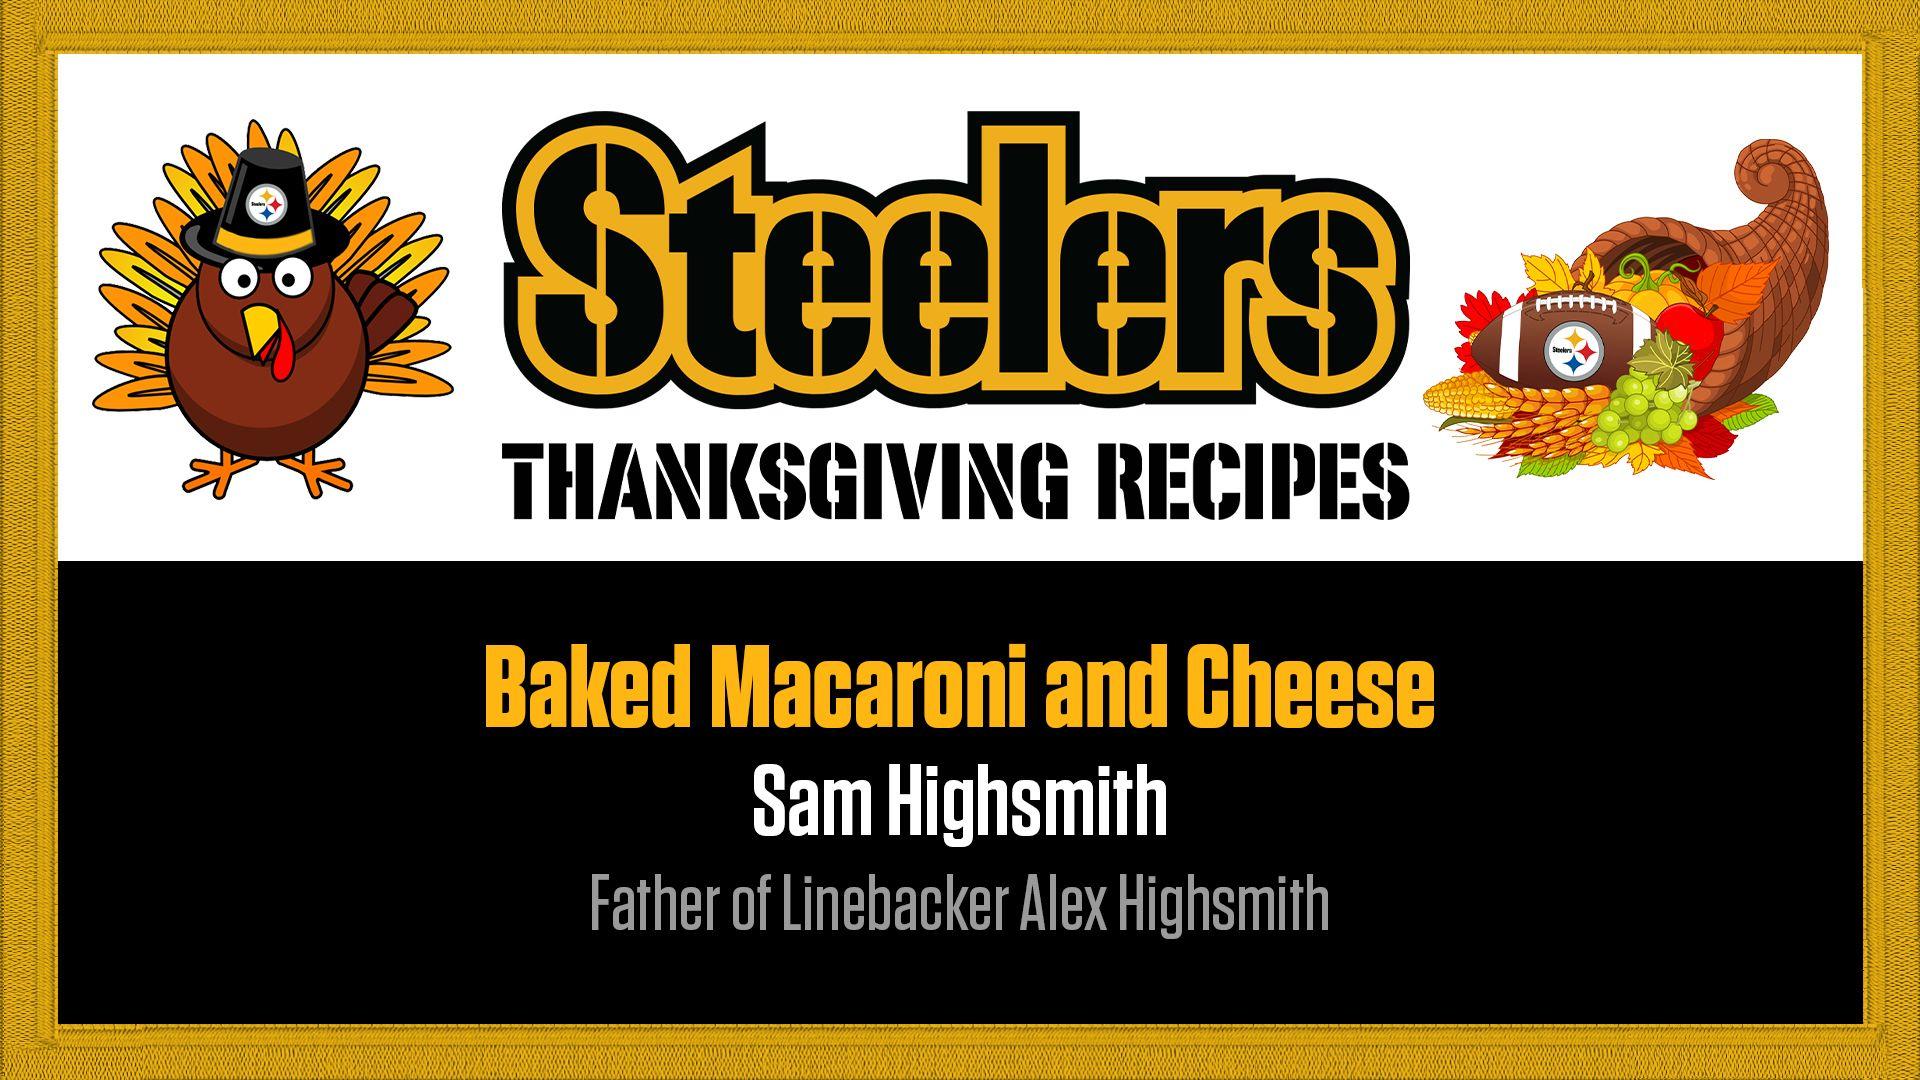 Recipe - baked macaroni and cheese_sam highsmith